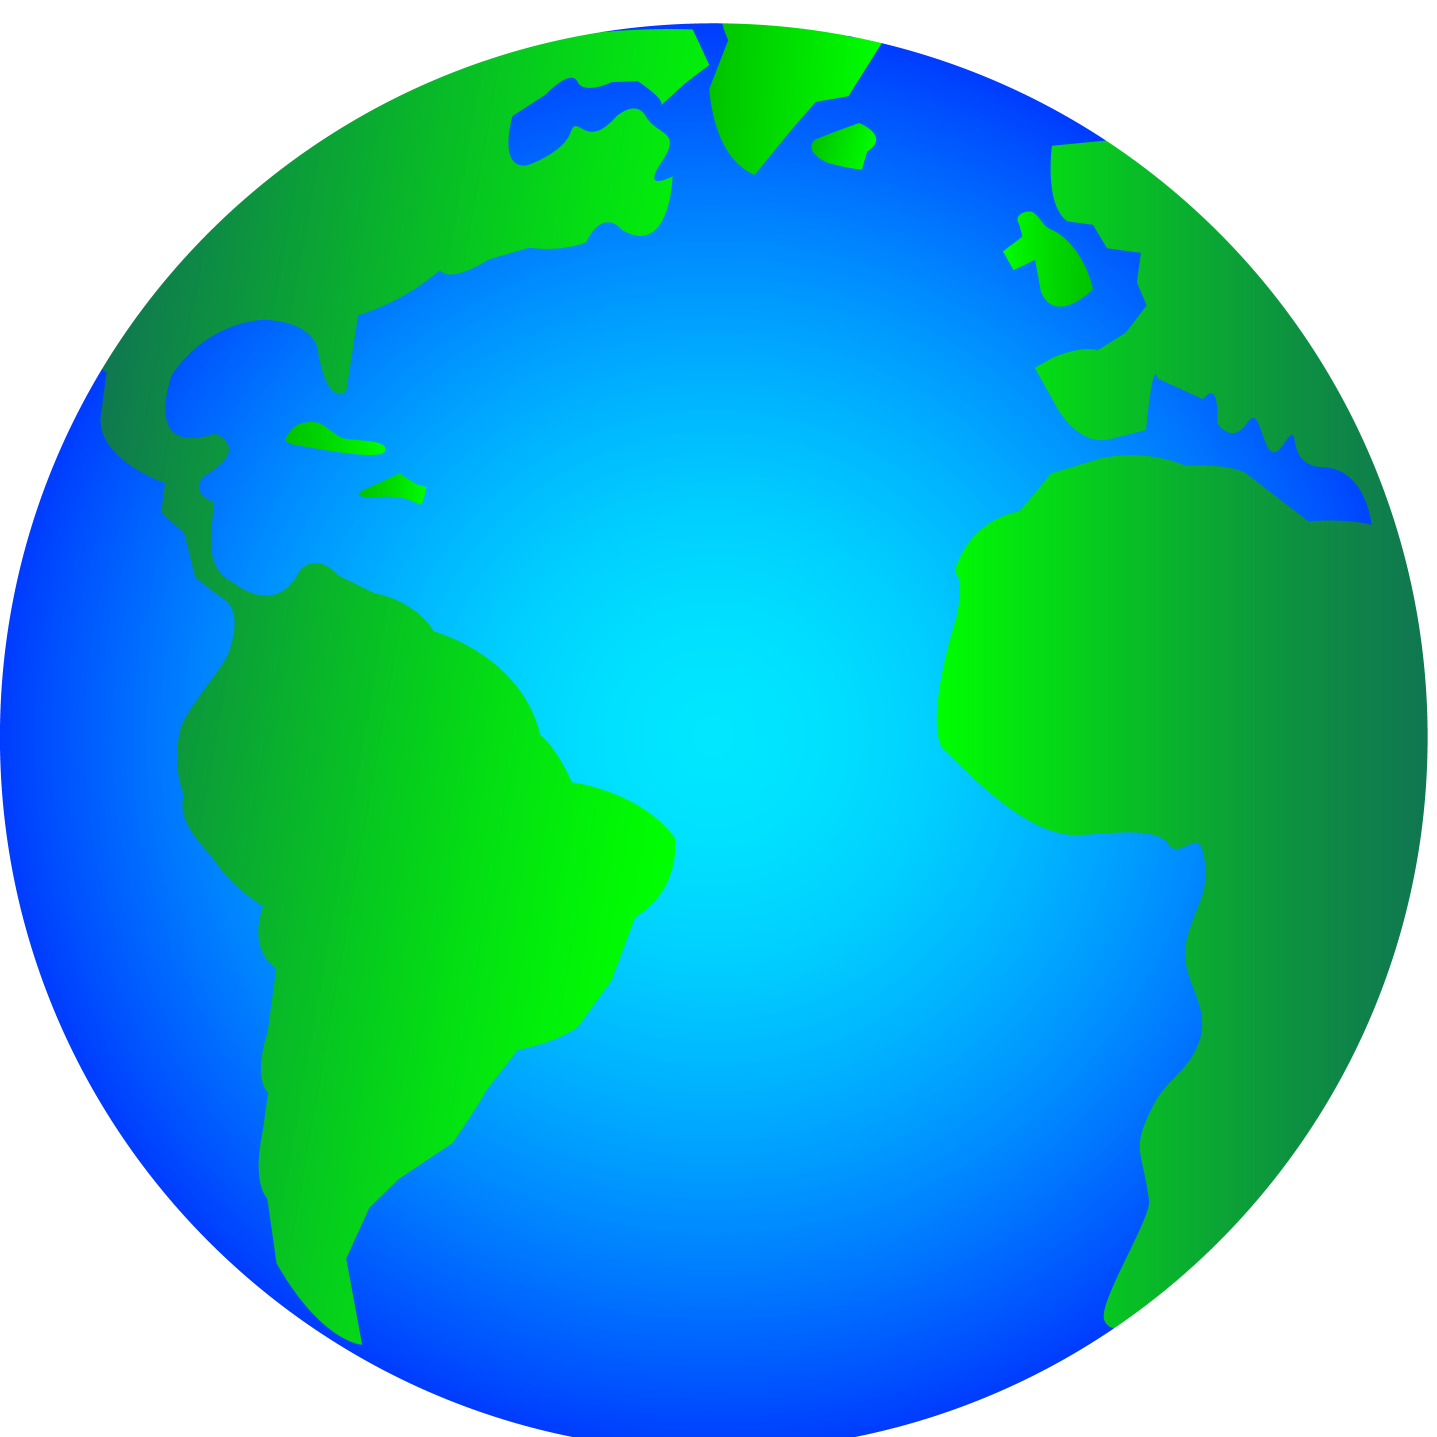 Global pics pix twitter. Planets clipart blue planet